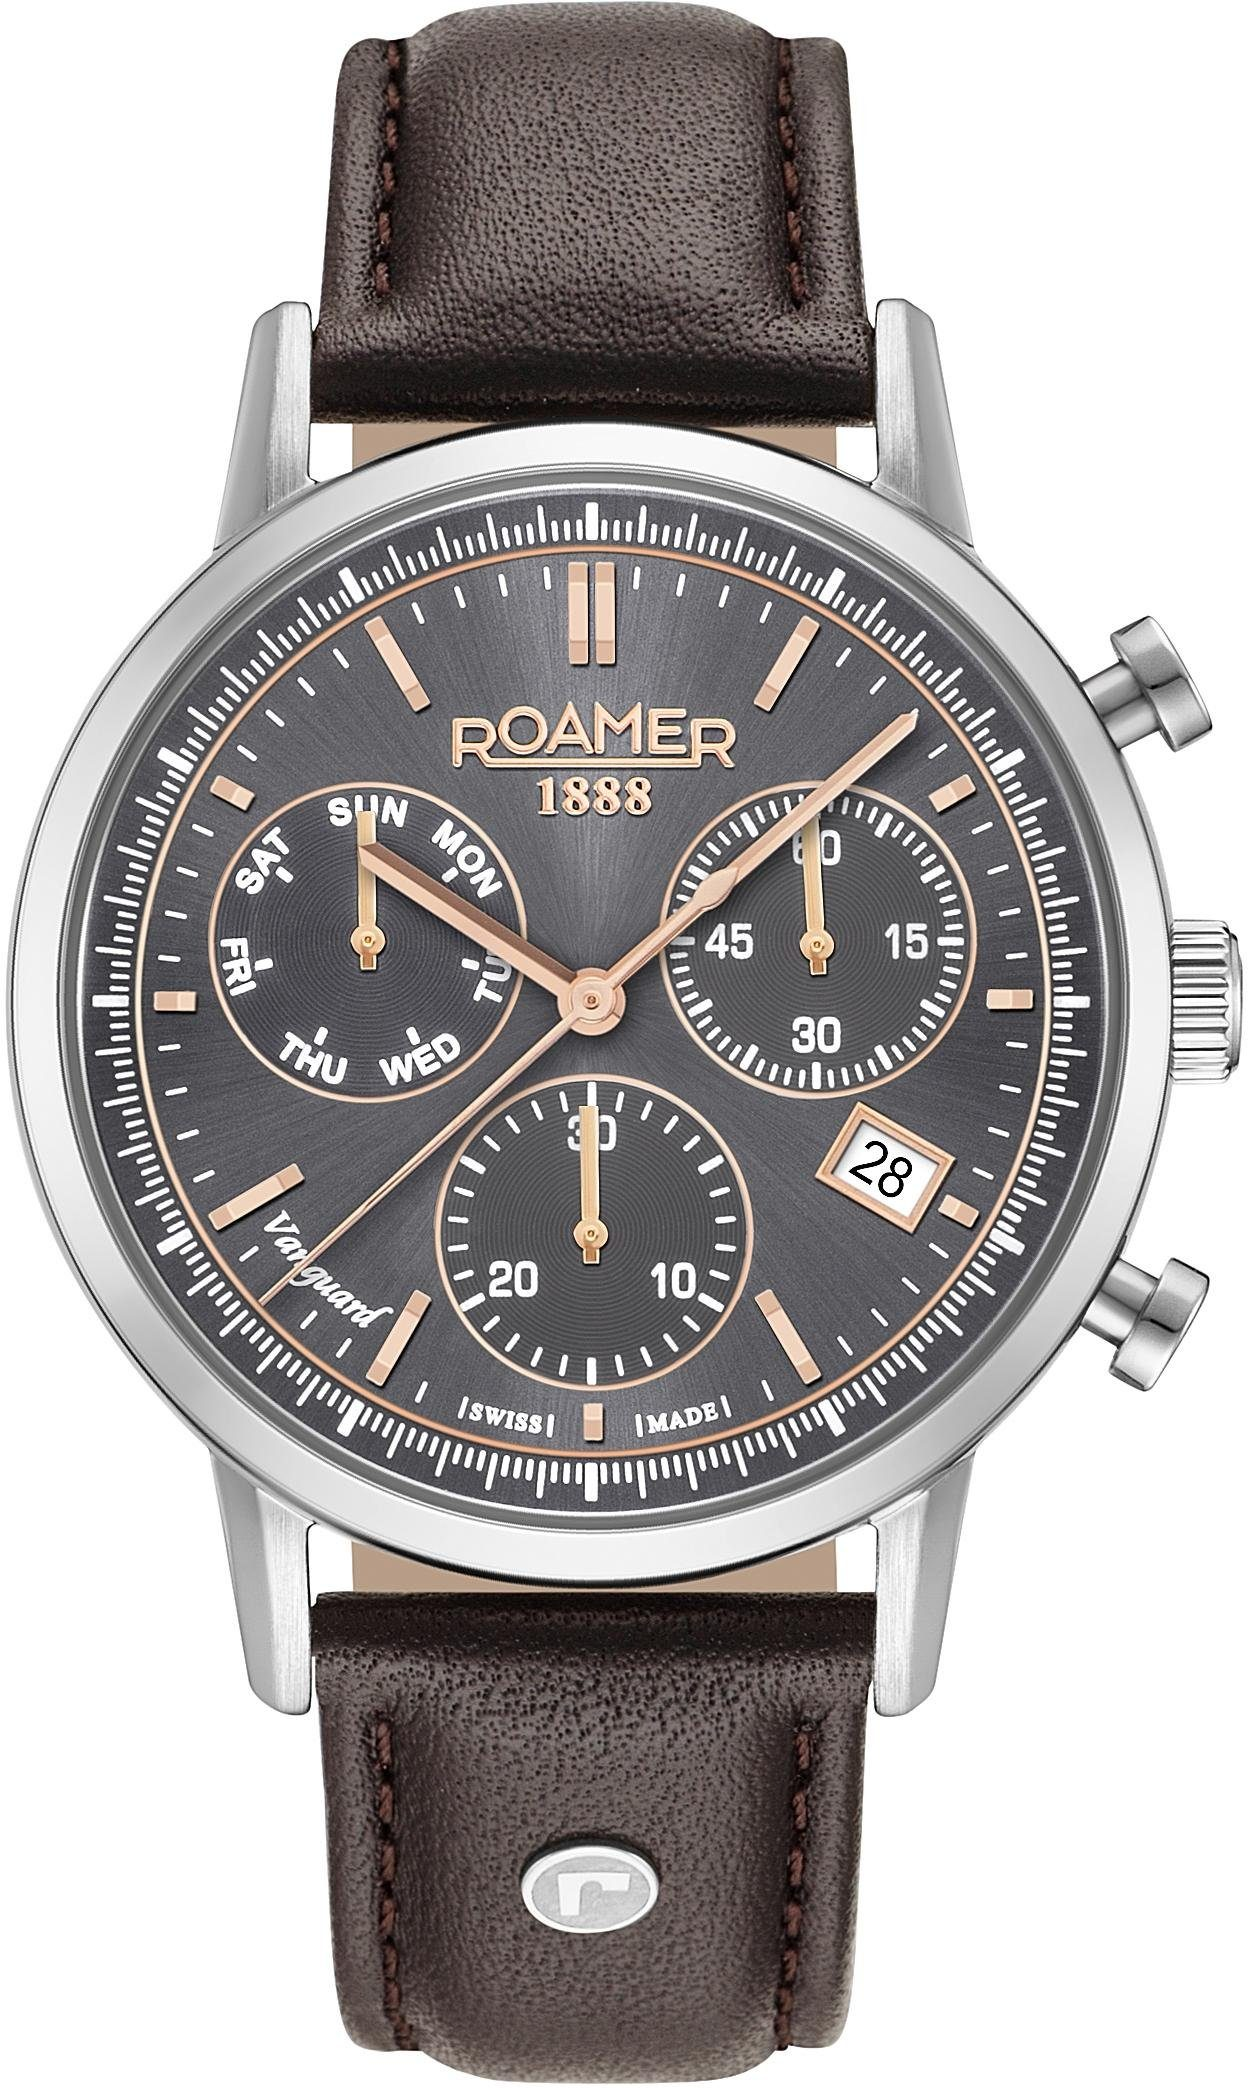 Roamer Chronograph »VANGUARD CHRONO II, 975819 41 05 09« mit kleiner Sekunde